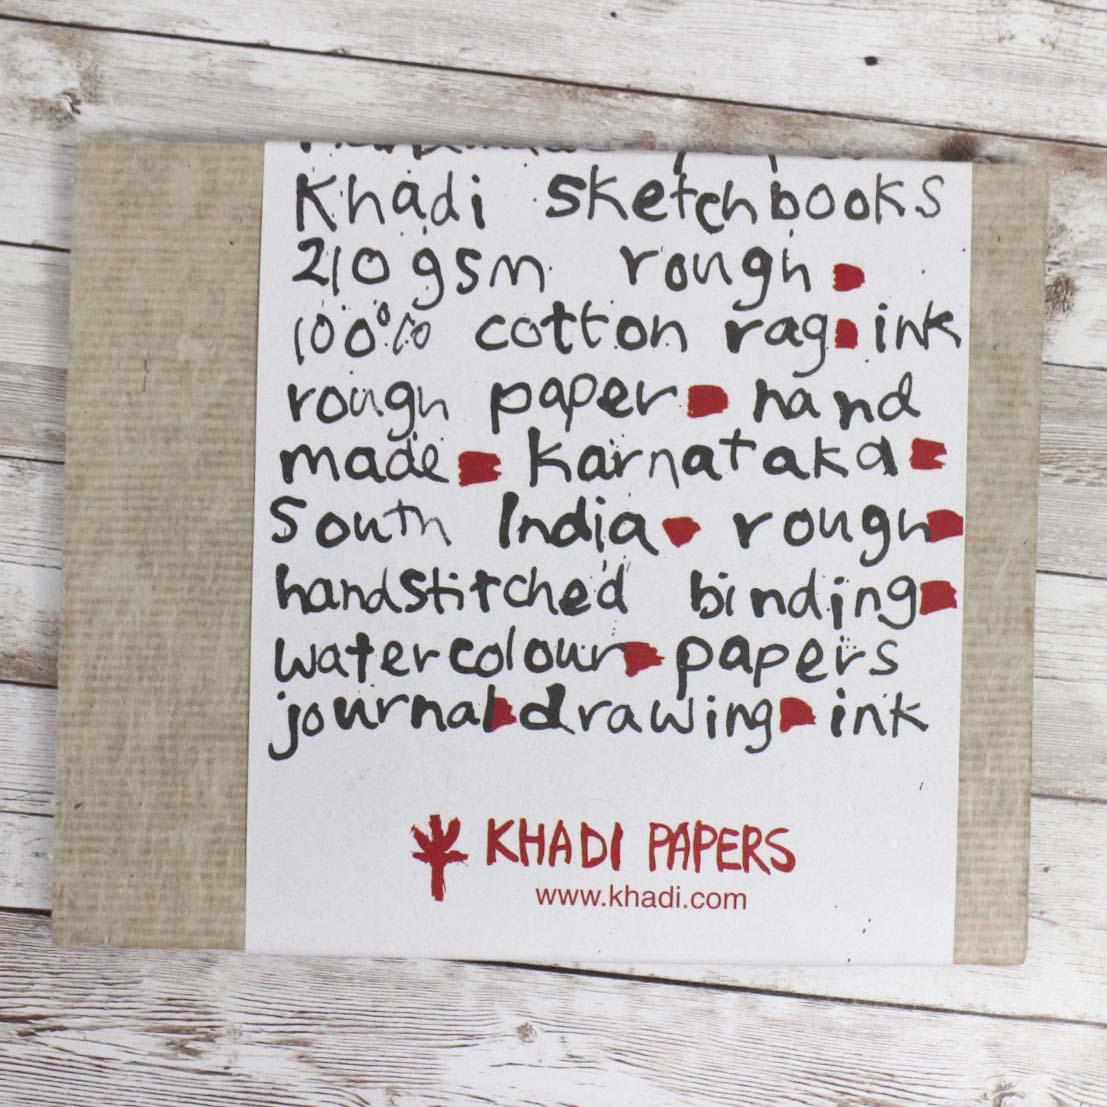 Khadi Paper印度水彩本 與單色畫練習